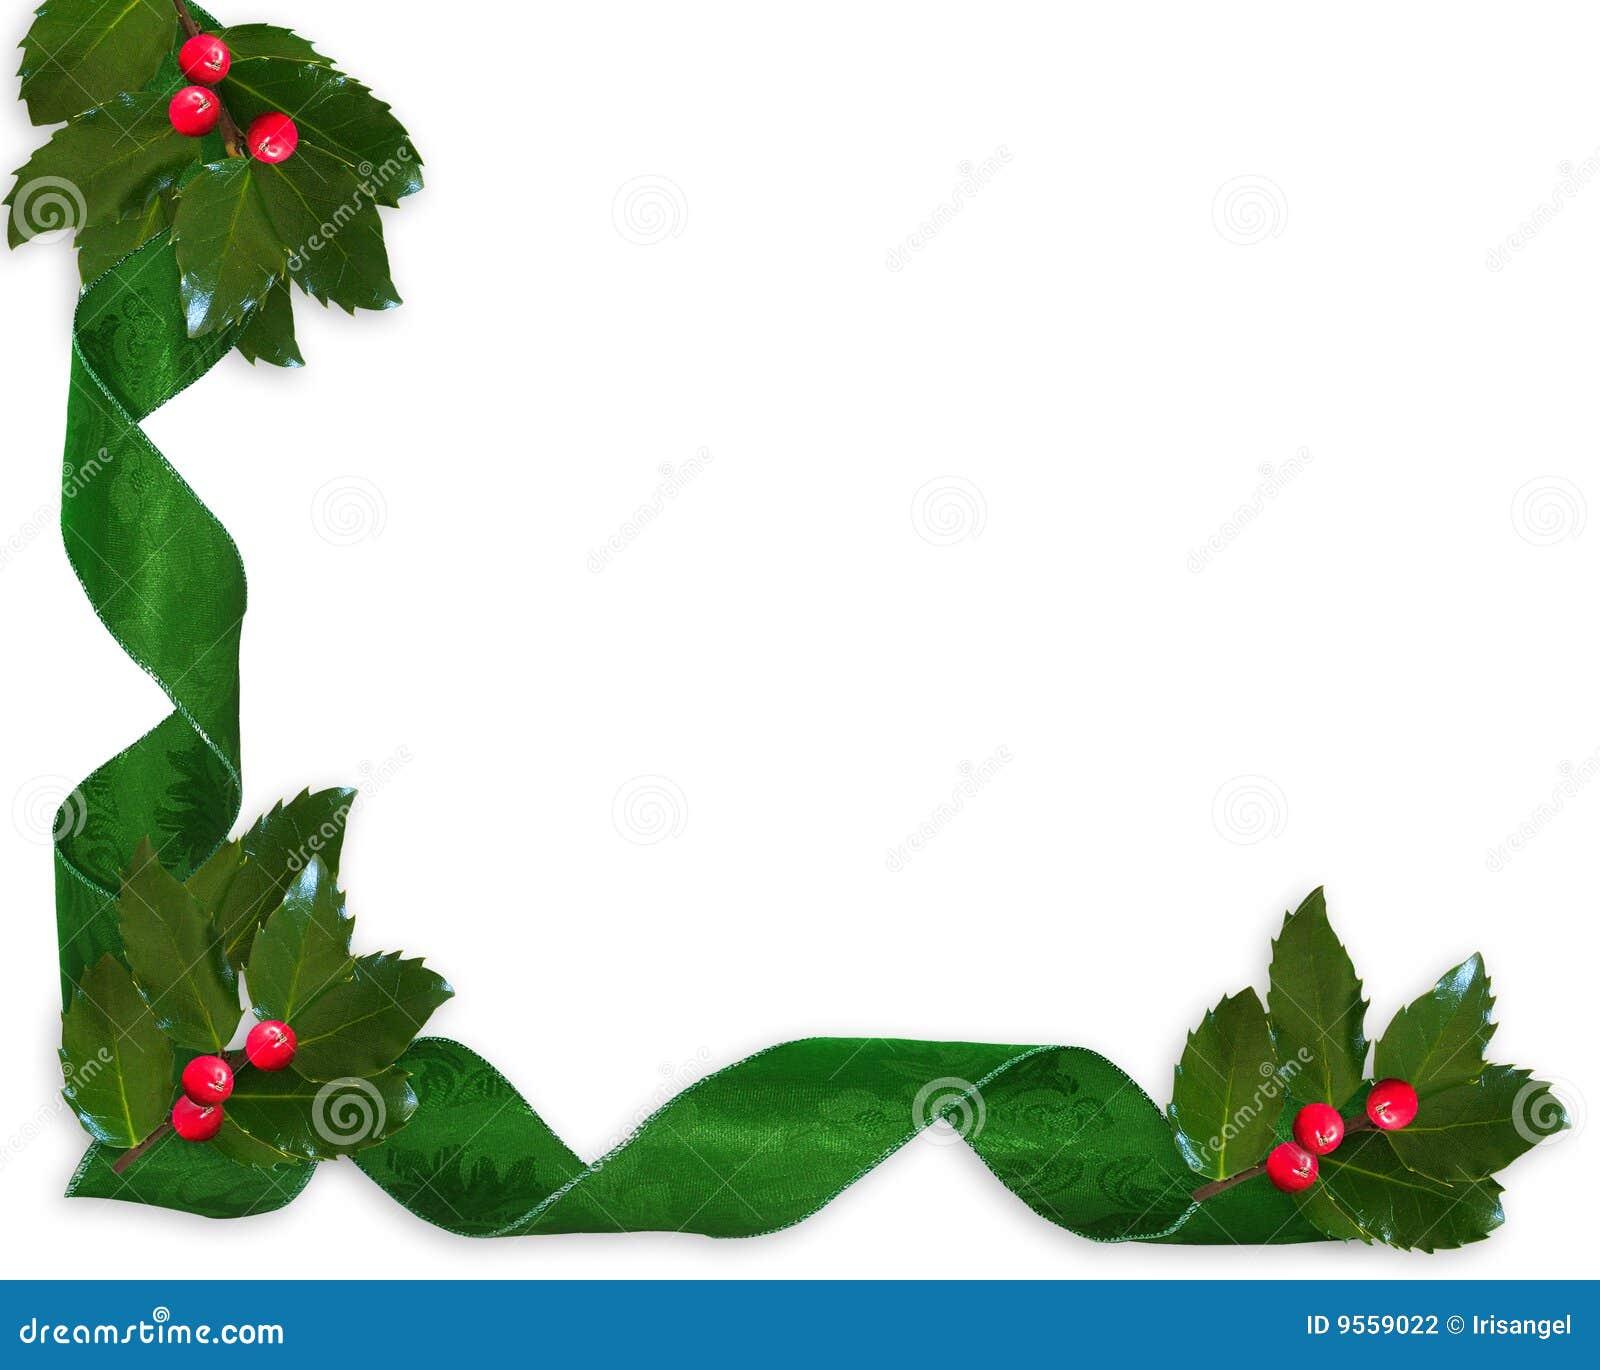 christmas clipart holly border - photo #23